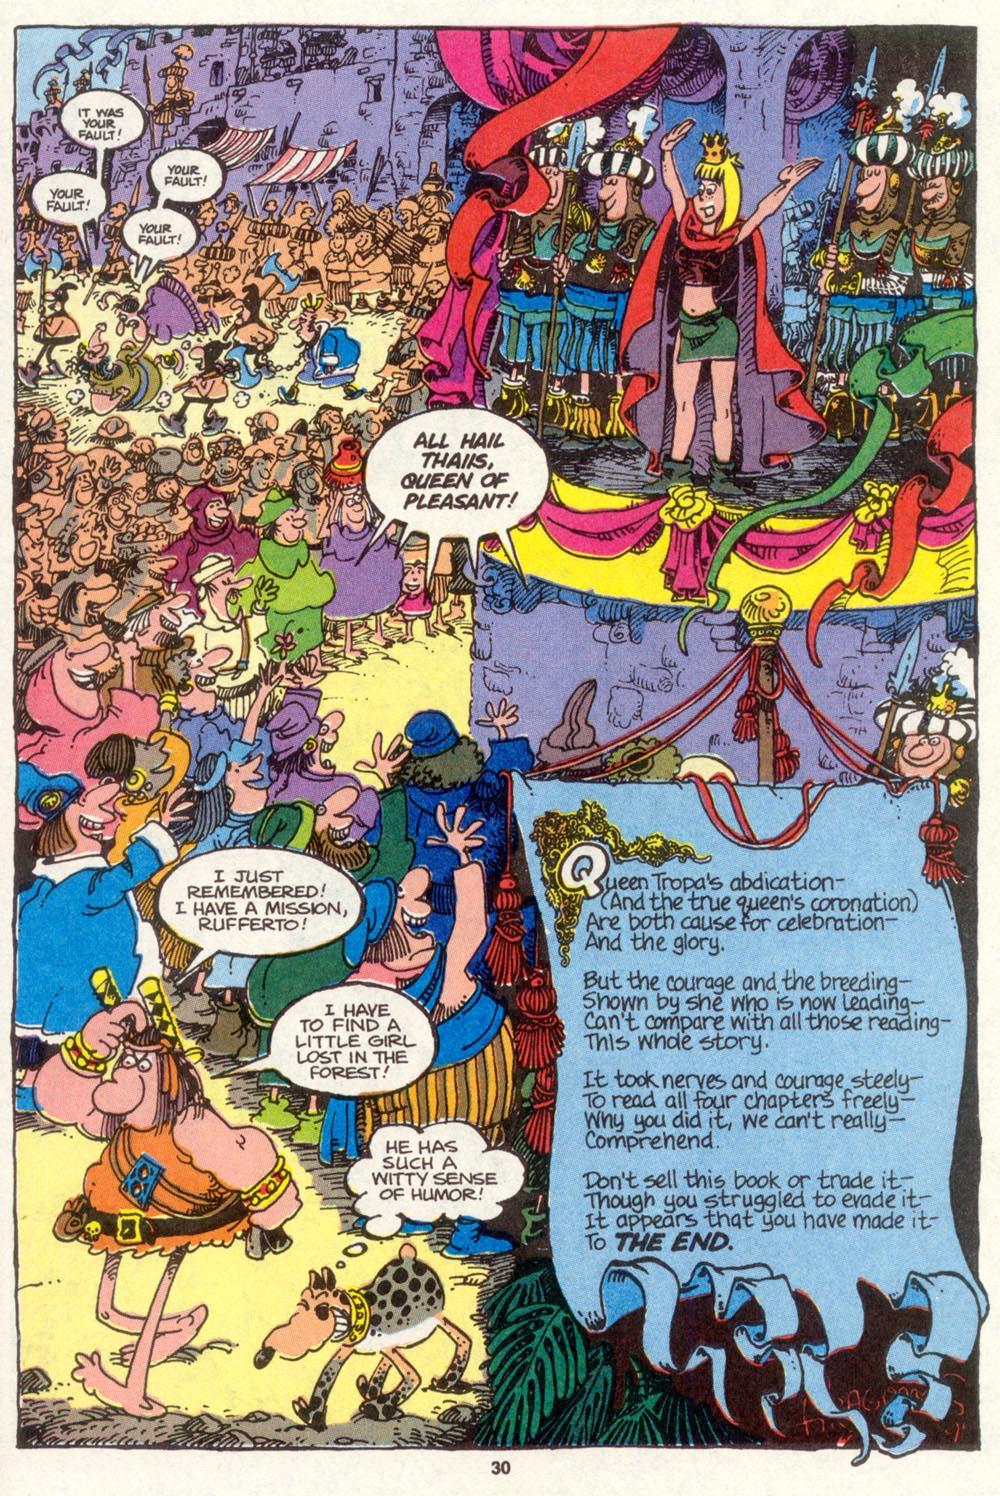 Read online Sergio Aragonés Groo the Wanderer comic -  Issue #83 - 23